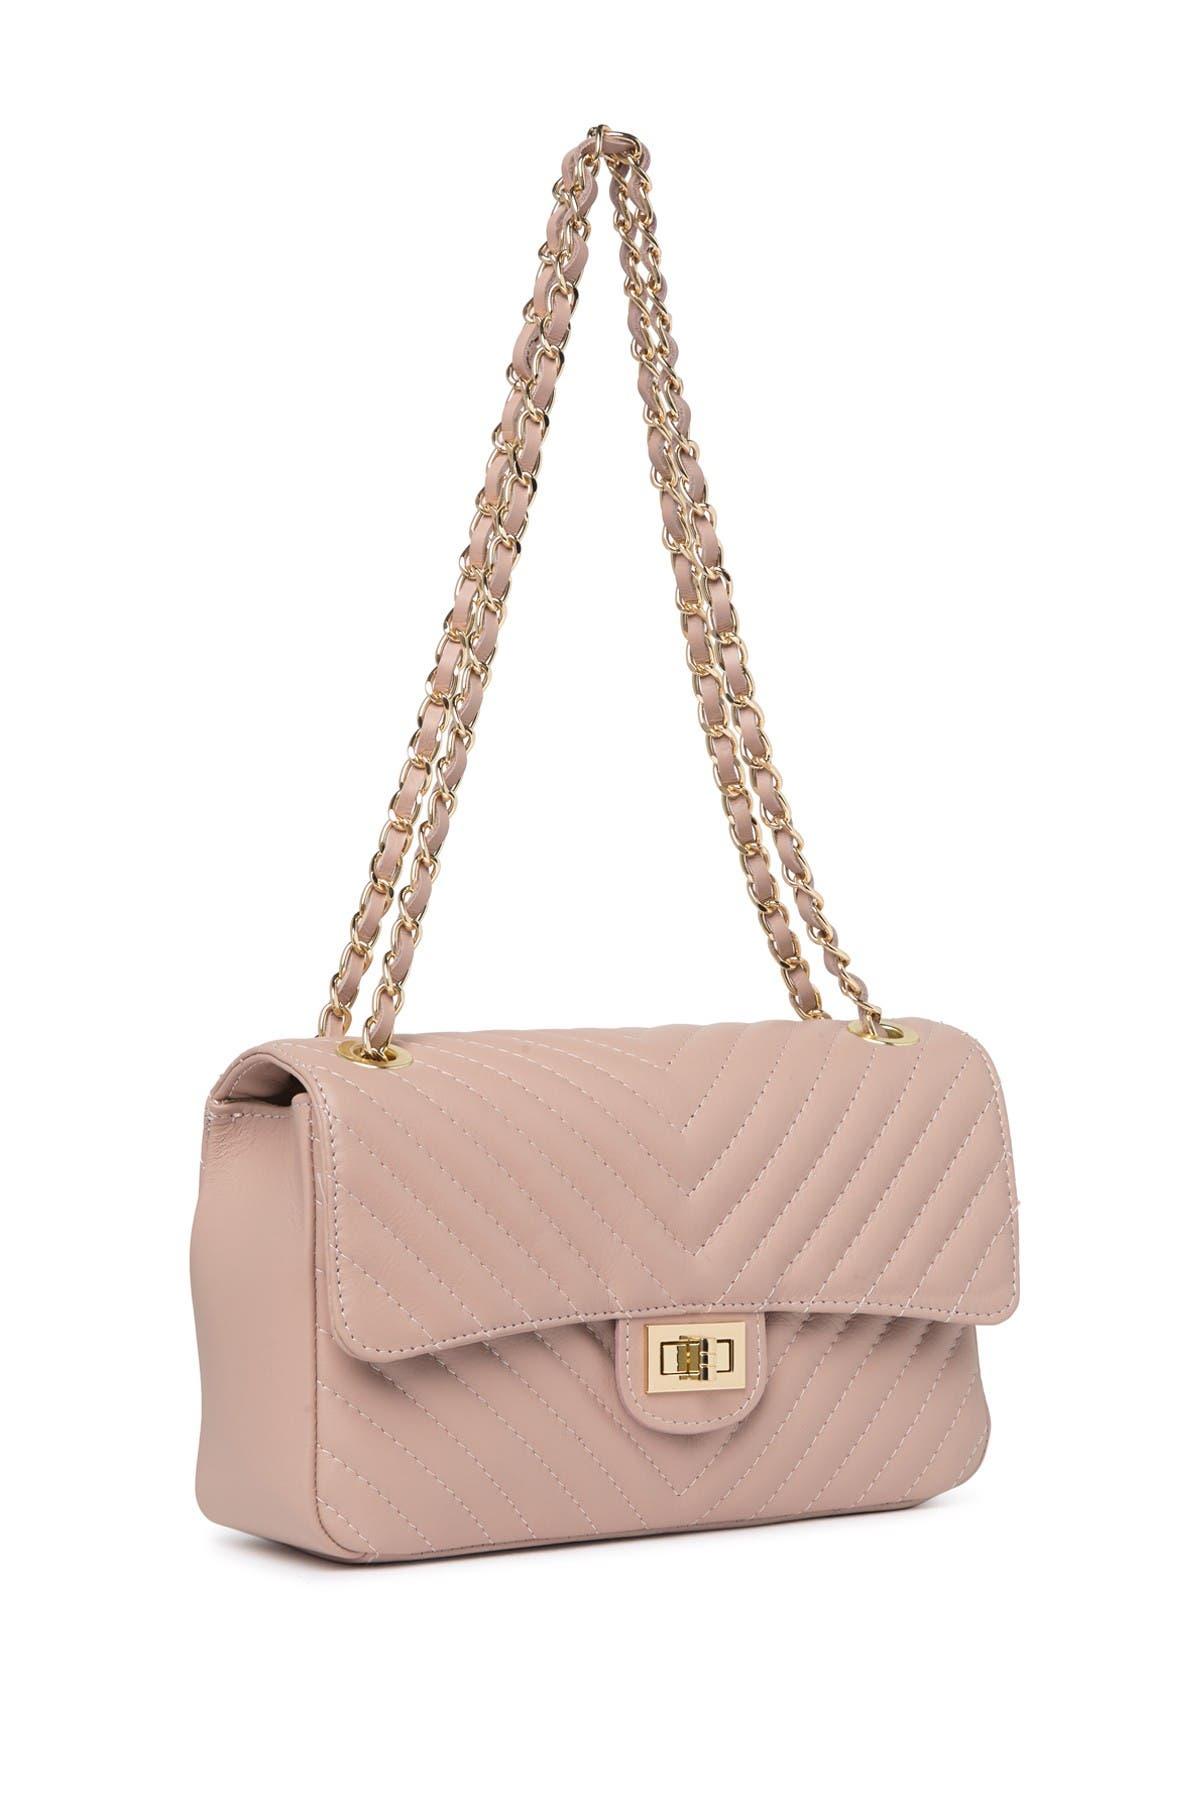 Image of Renata Corsi Quilted Leather Shoulder Bag